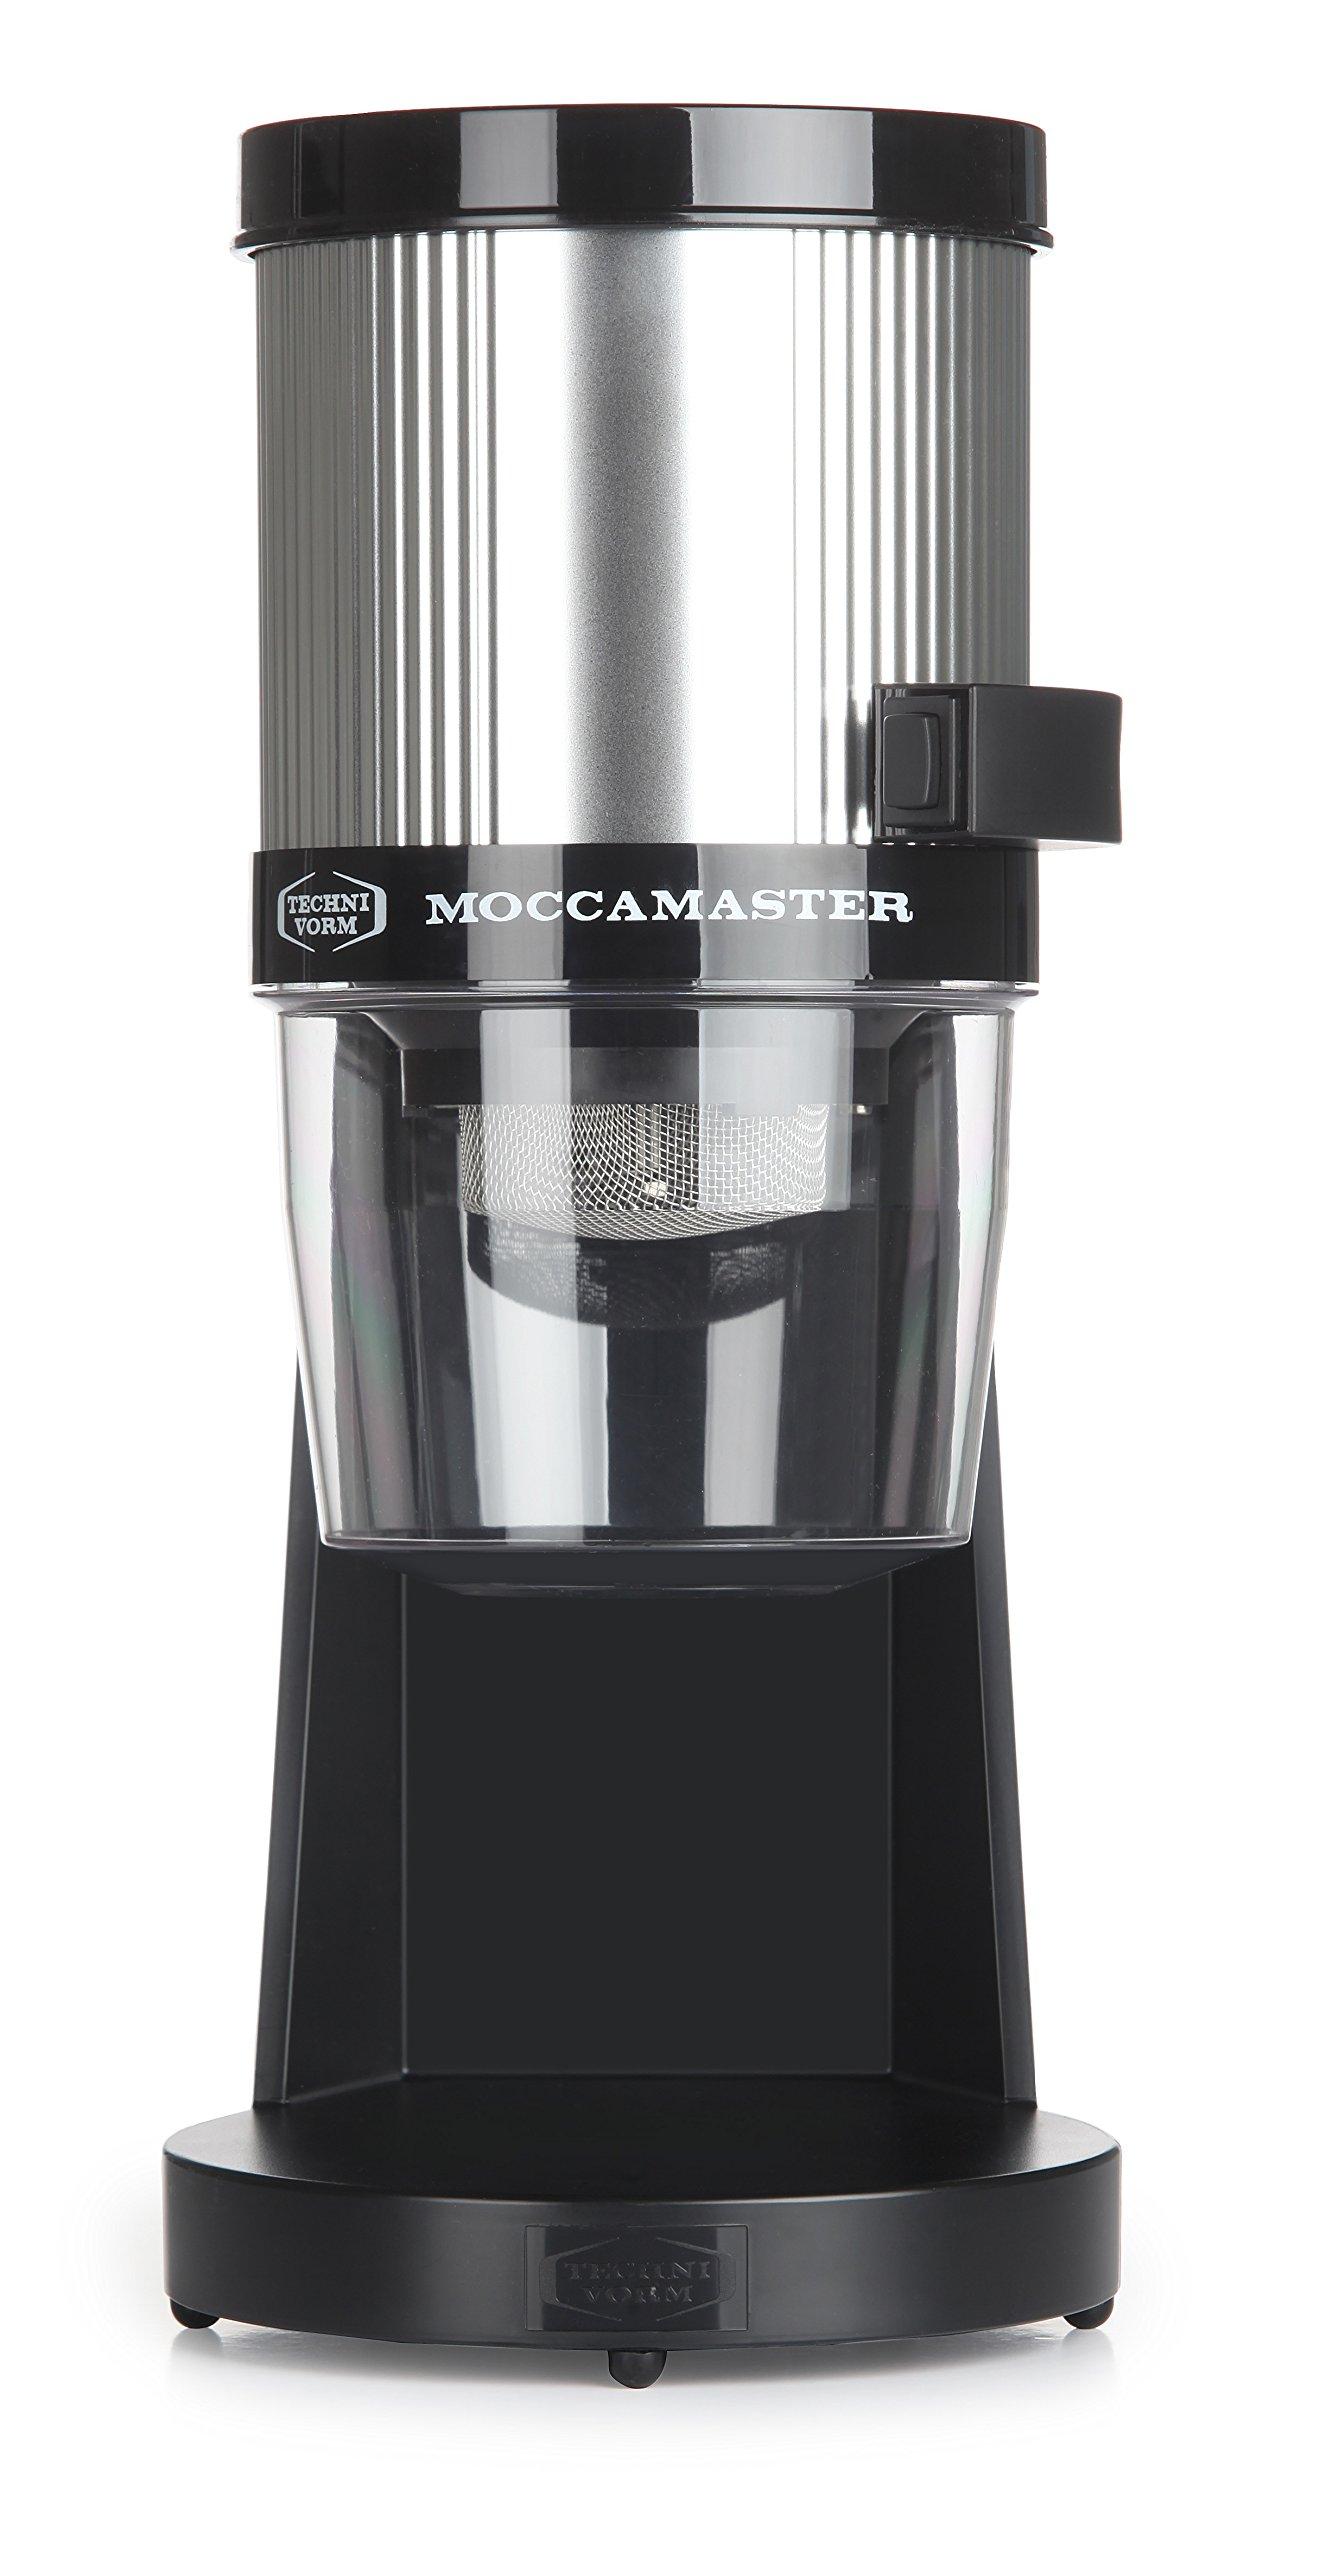 Technivorm Moccamaster 49312 KM4 TT Grinder, 14 oz, Polished Silver Finish by Technivorm Moccamaster